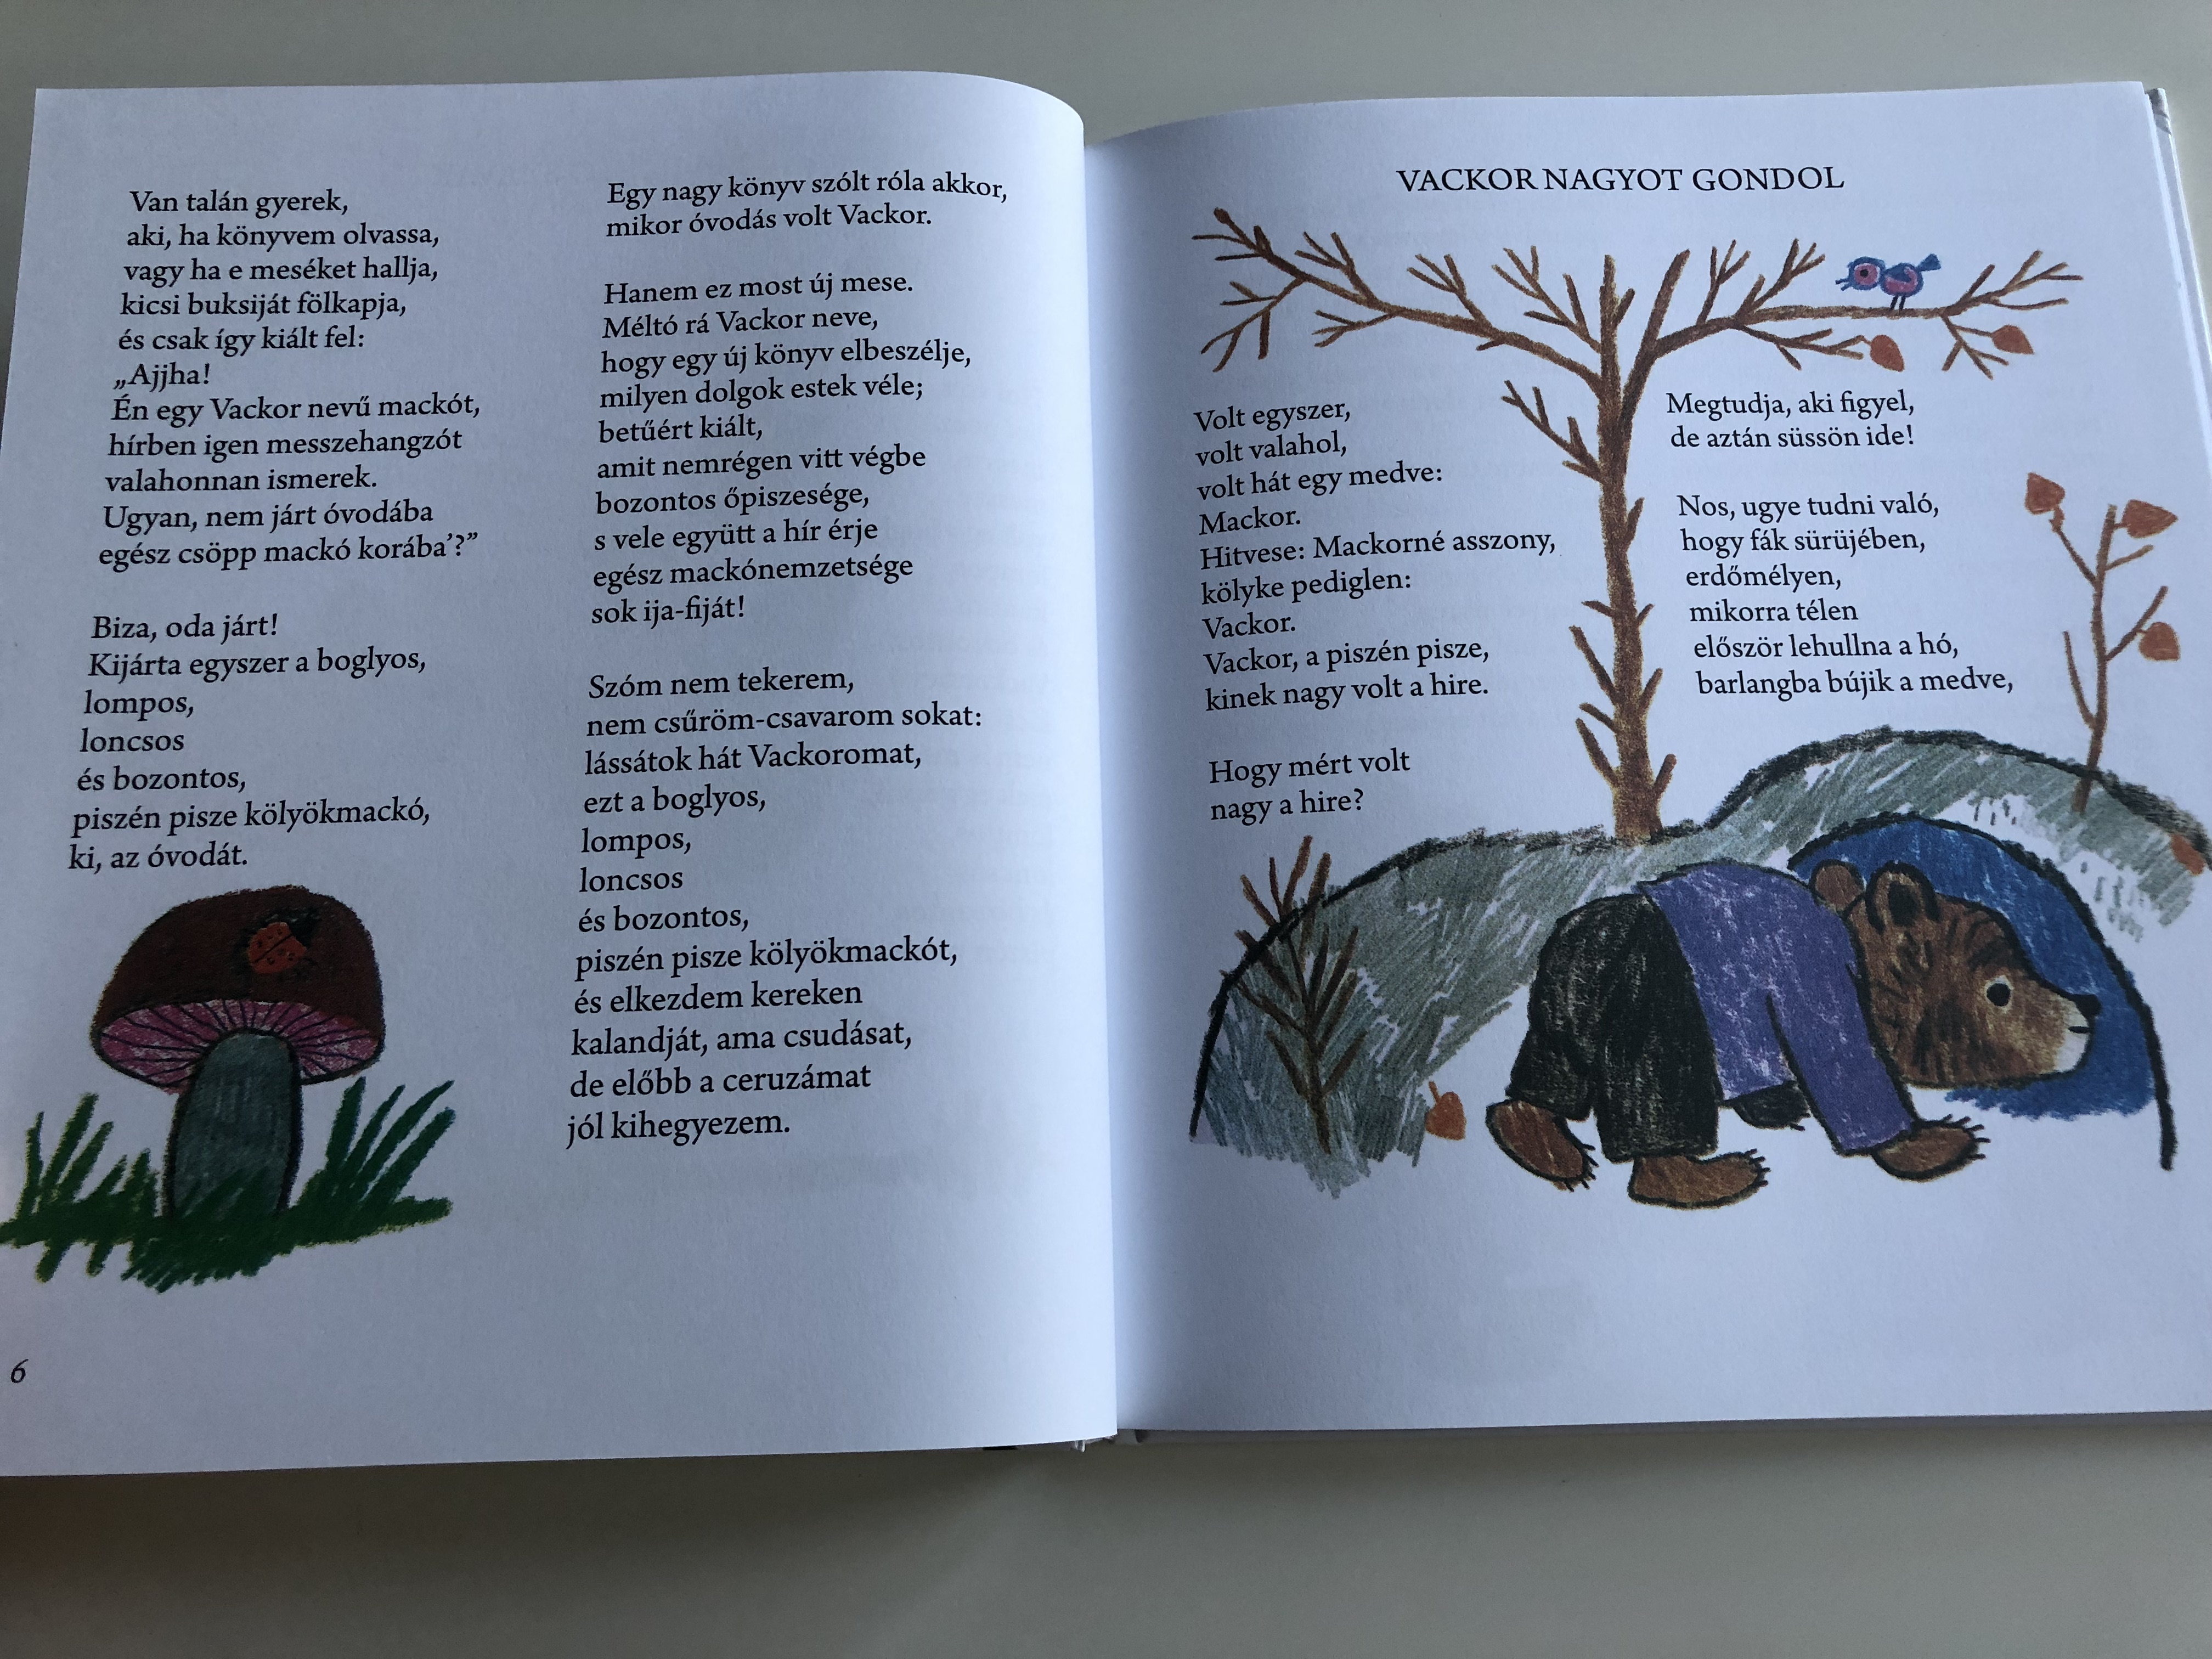 vackor-vil-got-l-t-by-kormos-istv-n-hungarian-children-s-poems-about-a-teddy-bear-m-ra-k-nyvkiad-2016-3rd-edition-4-.jpg